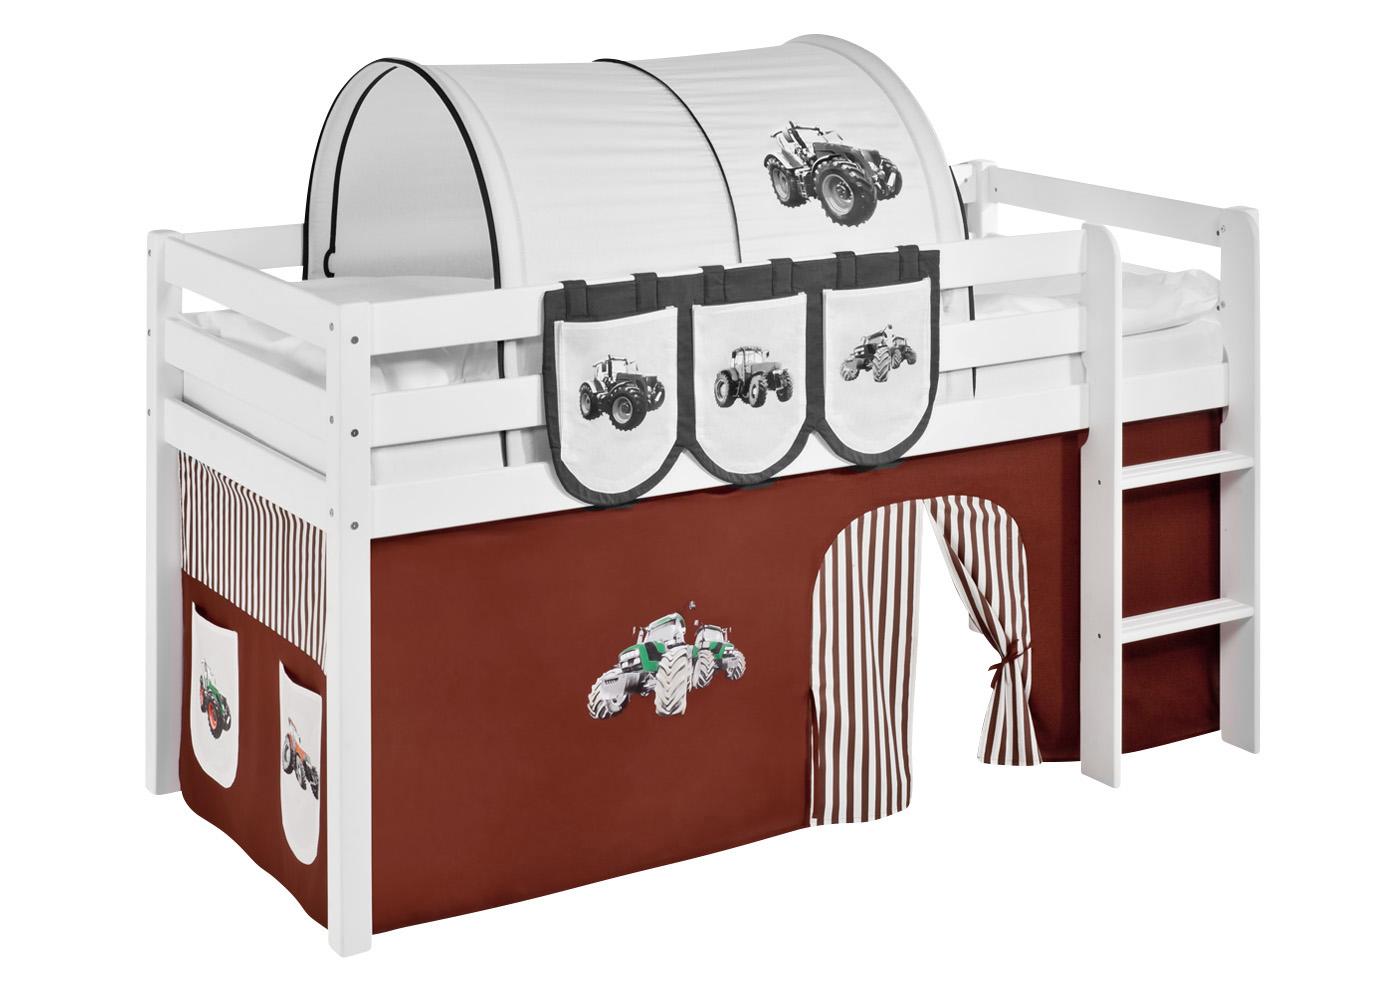 vorhang set f r kinder hochbetten spielbetten 2 teilig lilokids versch motive ebay. Black Bedroom Furniture Sets. Home Design Ideas